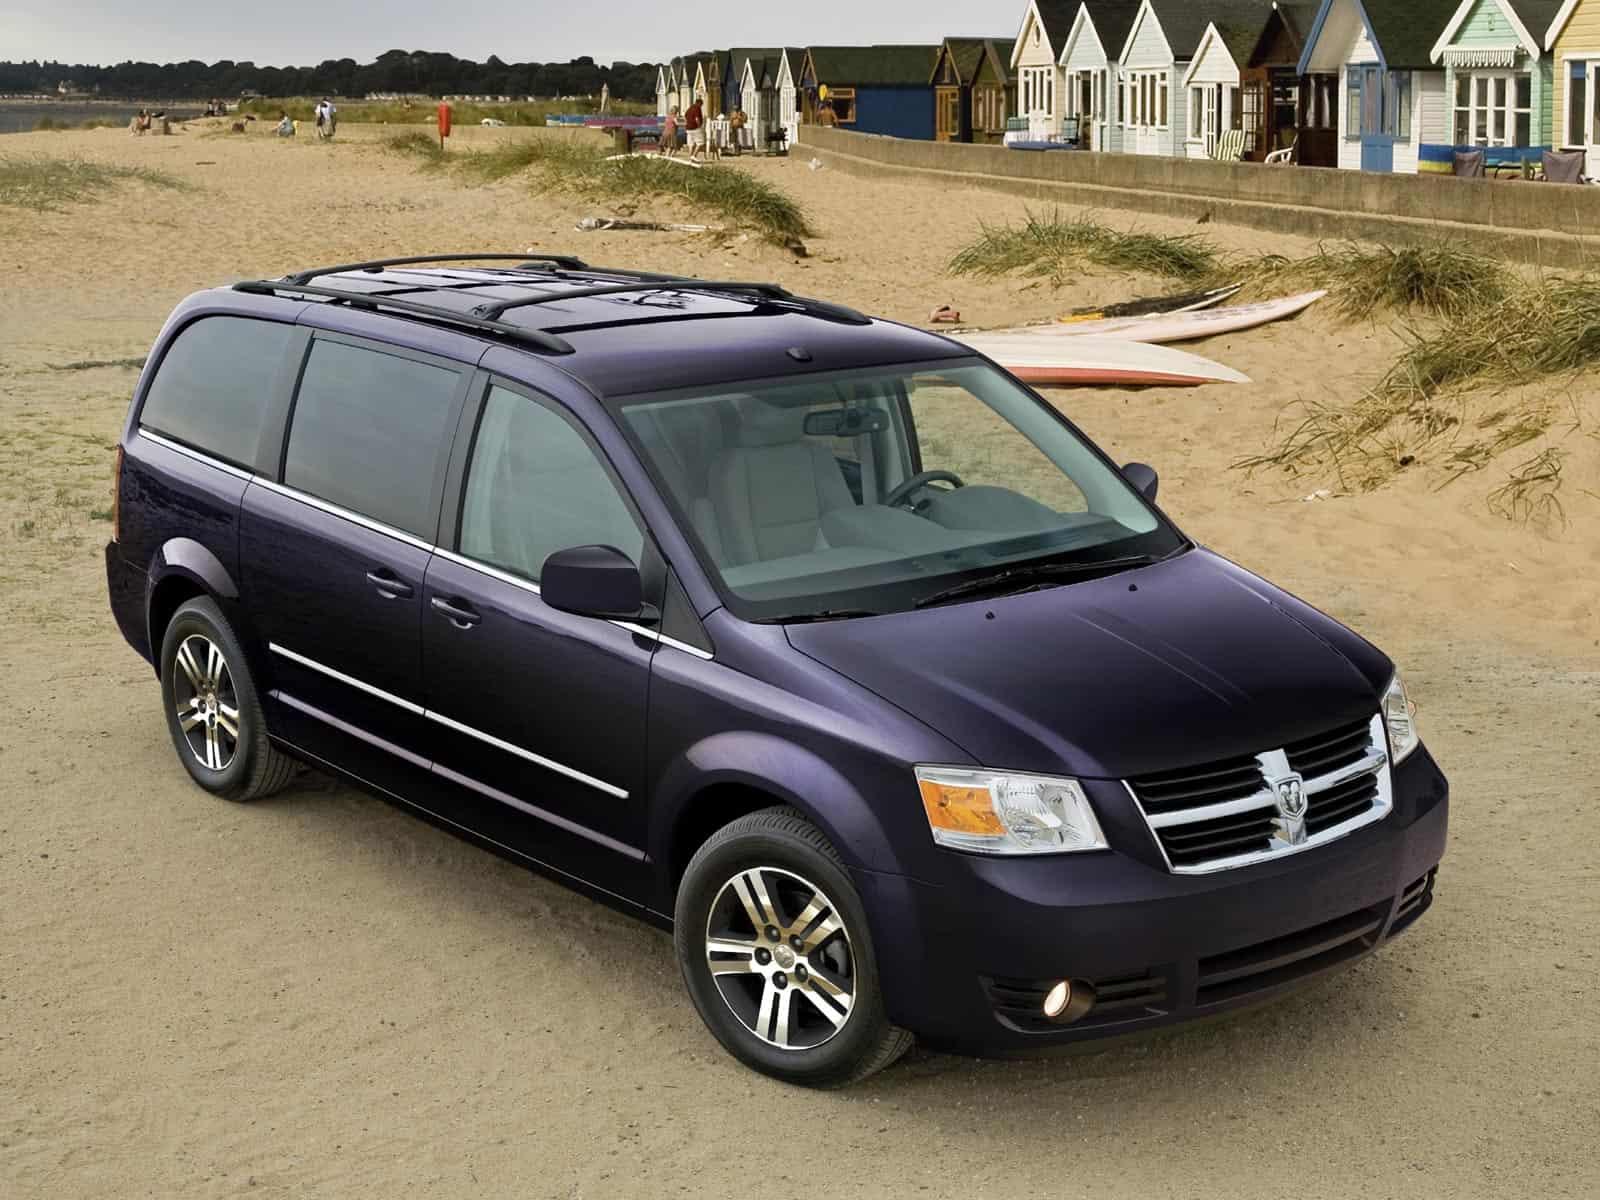 Dodge Grand Caravans are reliable cars under 5000